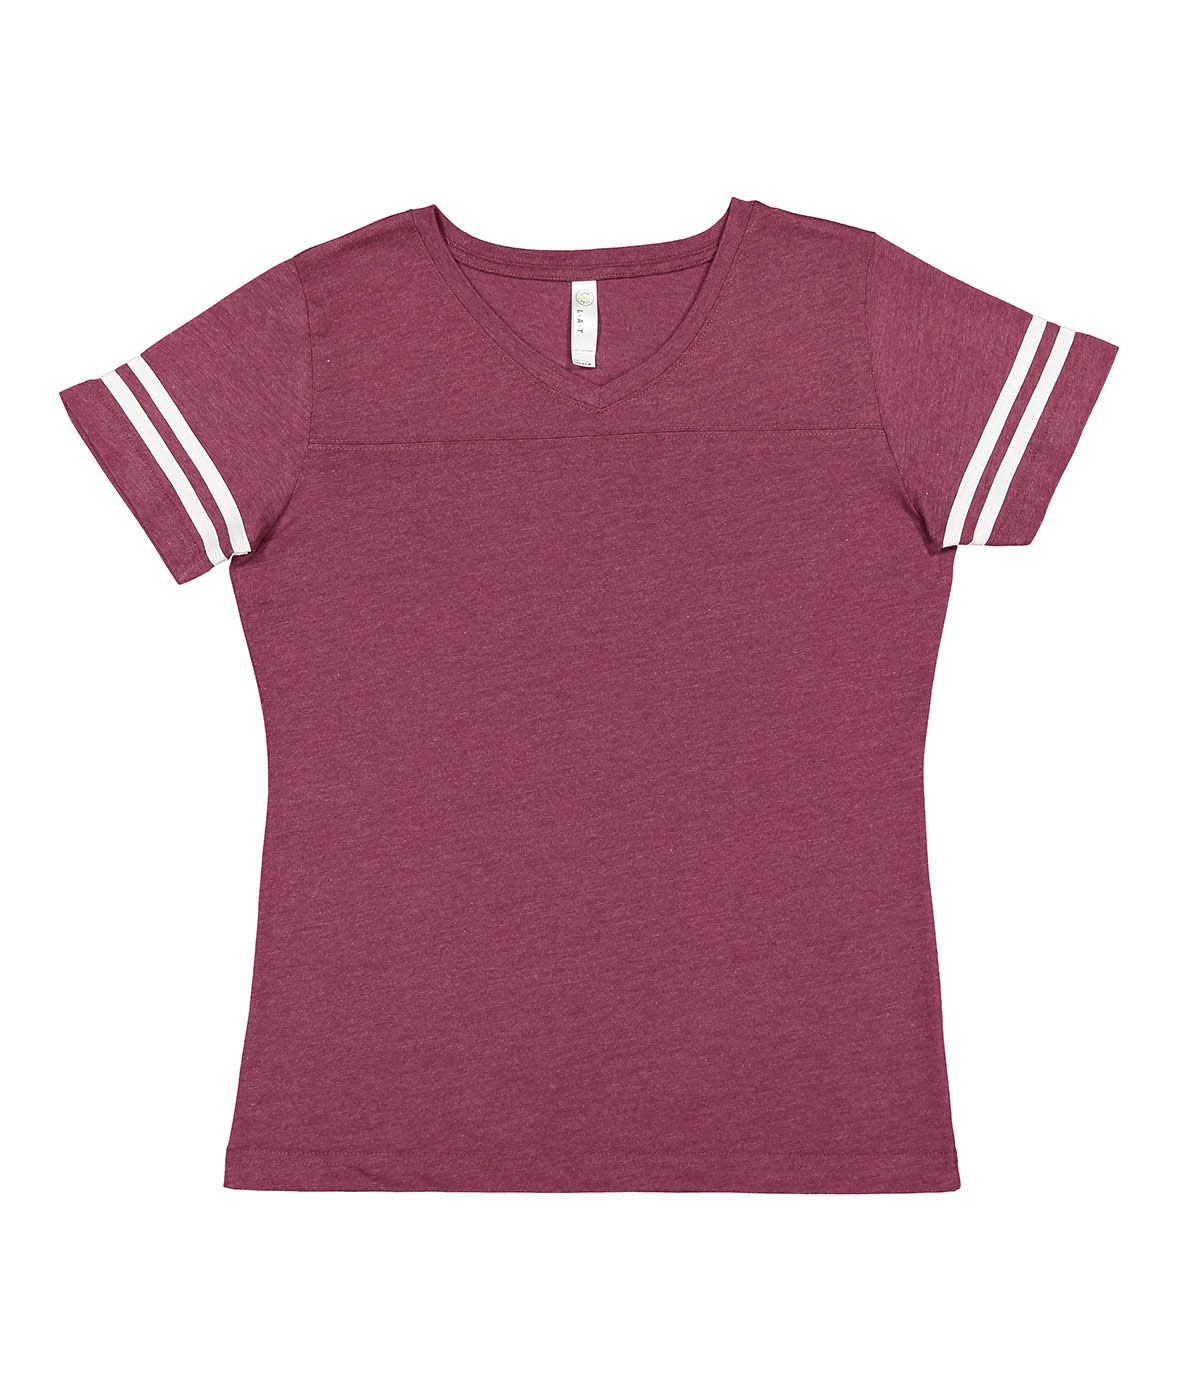 LAT Ladies' Fine Jersey Short Sleeve Football Tee